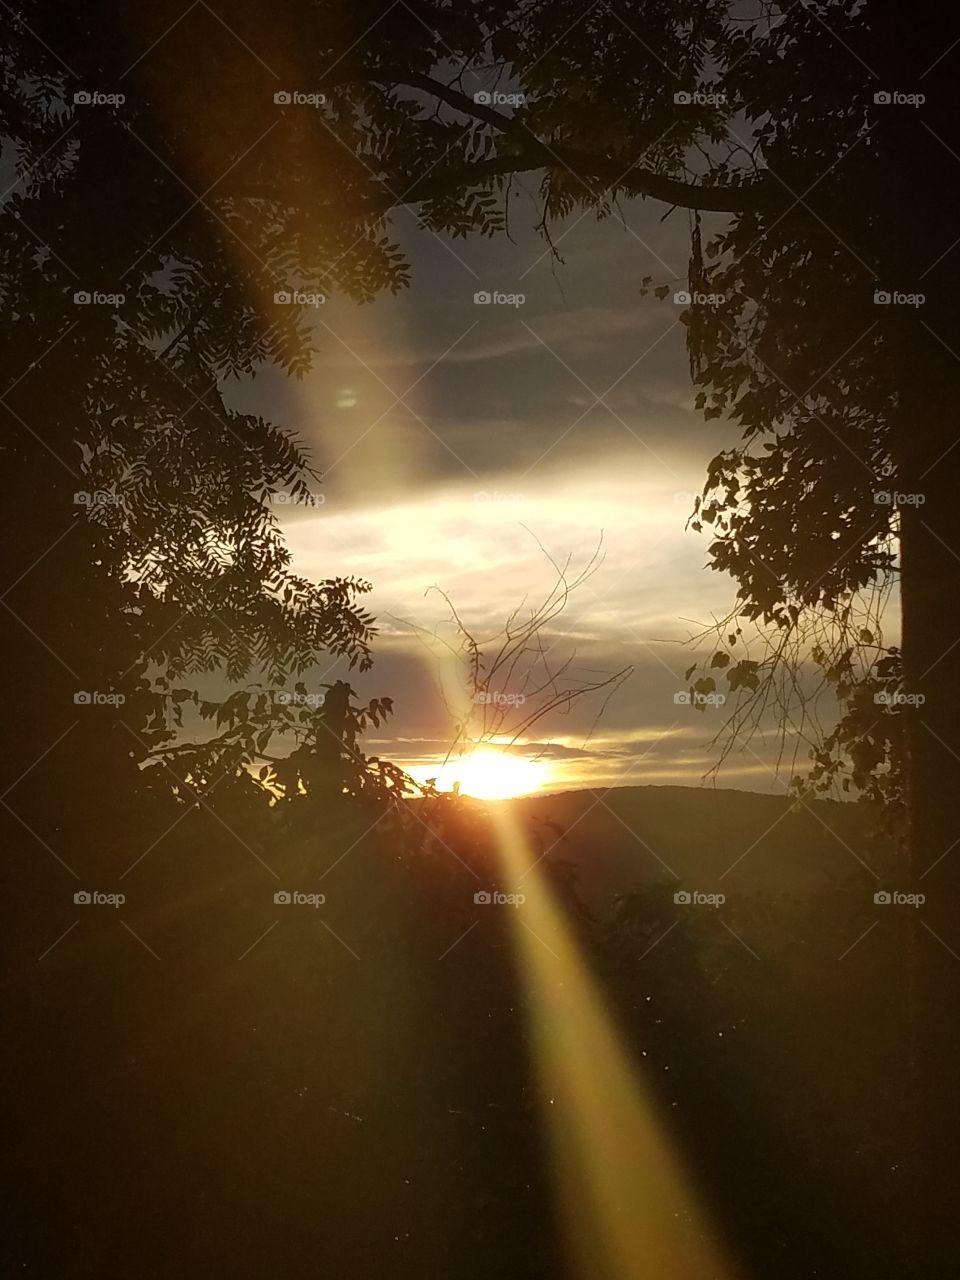 My Hazy Sunset